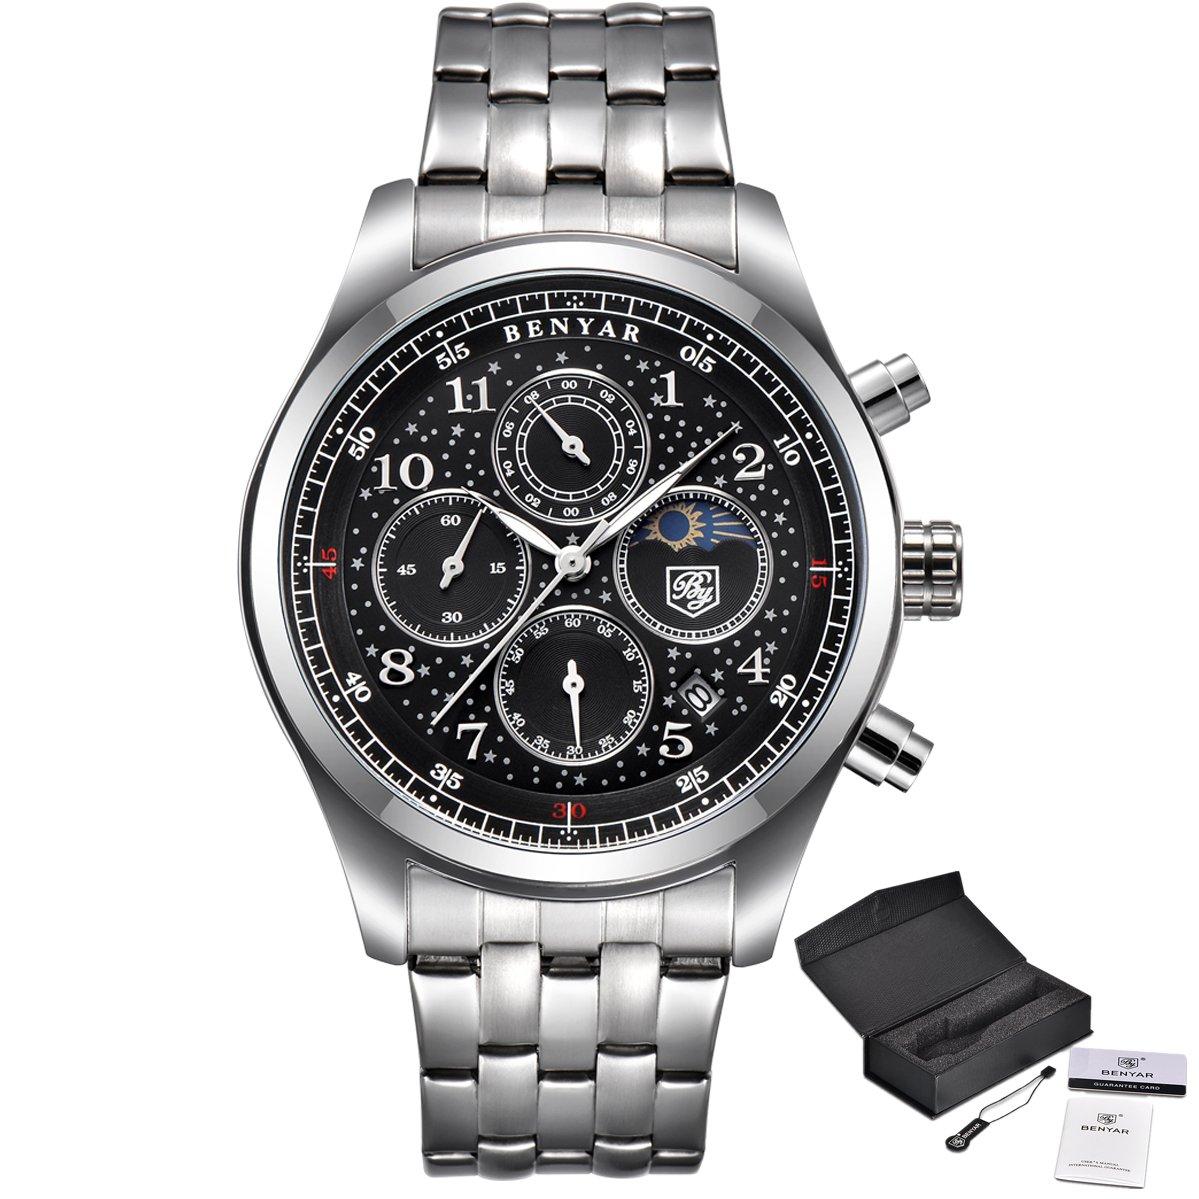 86b90b93ef21 Amazon.com  Men s Watch Luxury Brand Business Planet Sport Date Waterproof Steel  Chronograph Silver Black Quartz Watch (Silver black)  Watches